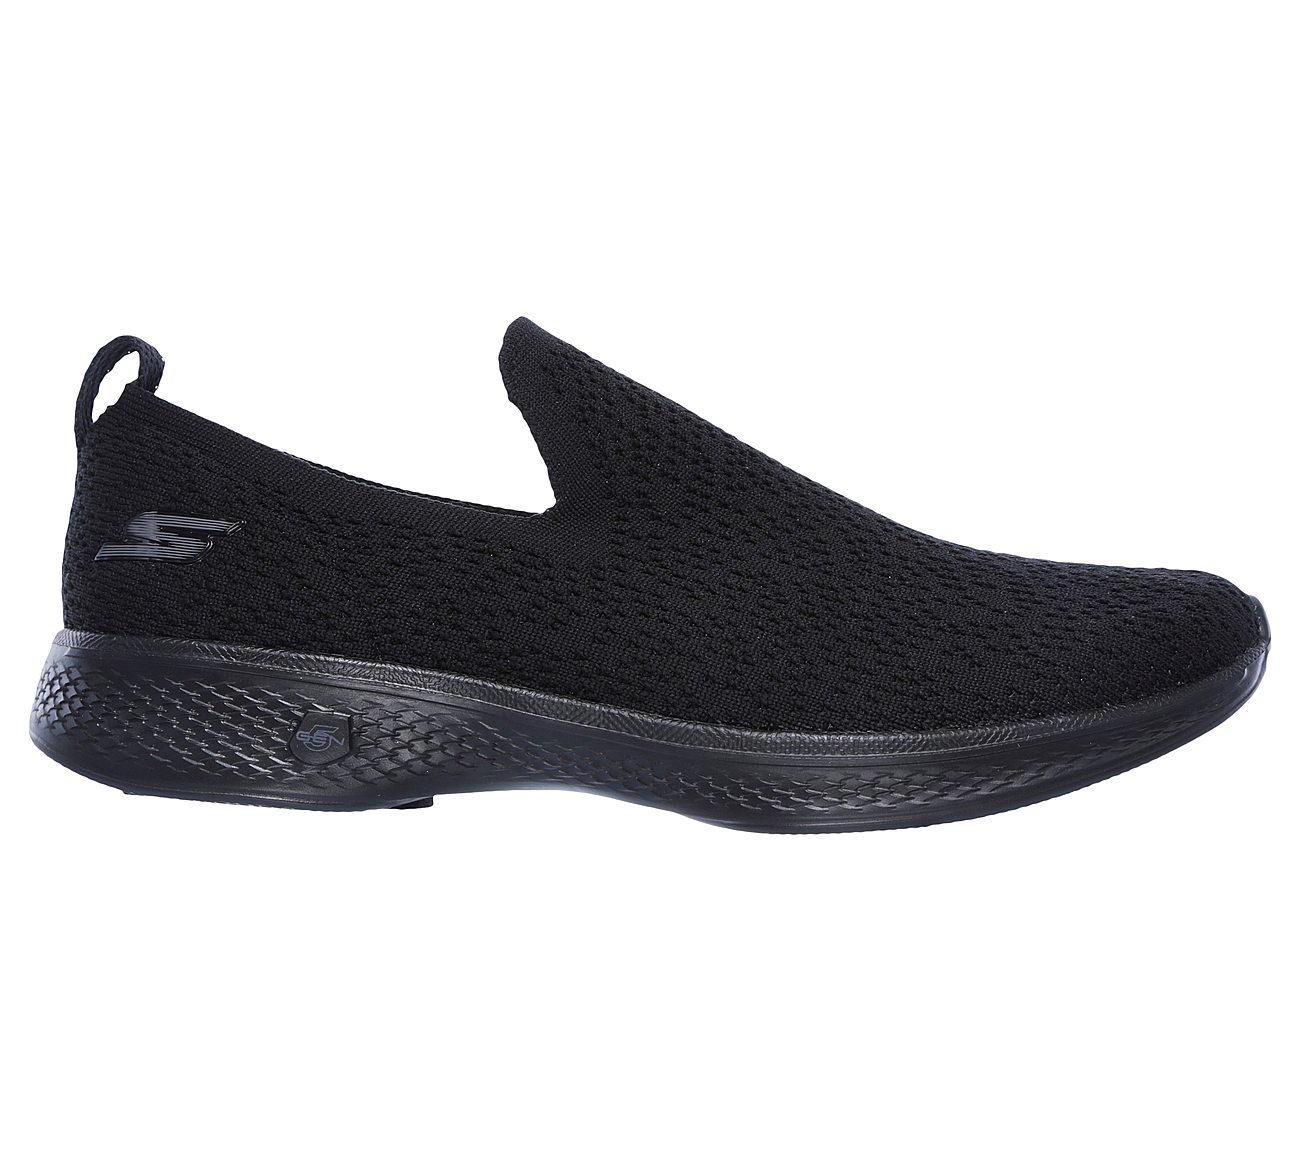 Buy SKECHERS Skechers GOwalk 4 Skechers Performance Shoes 8reg4